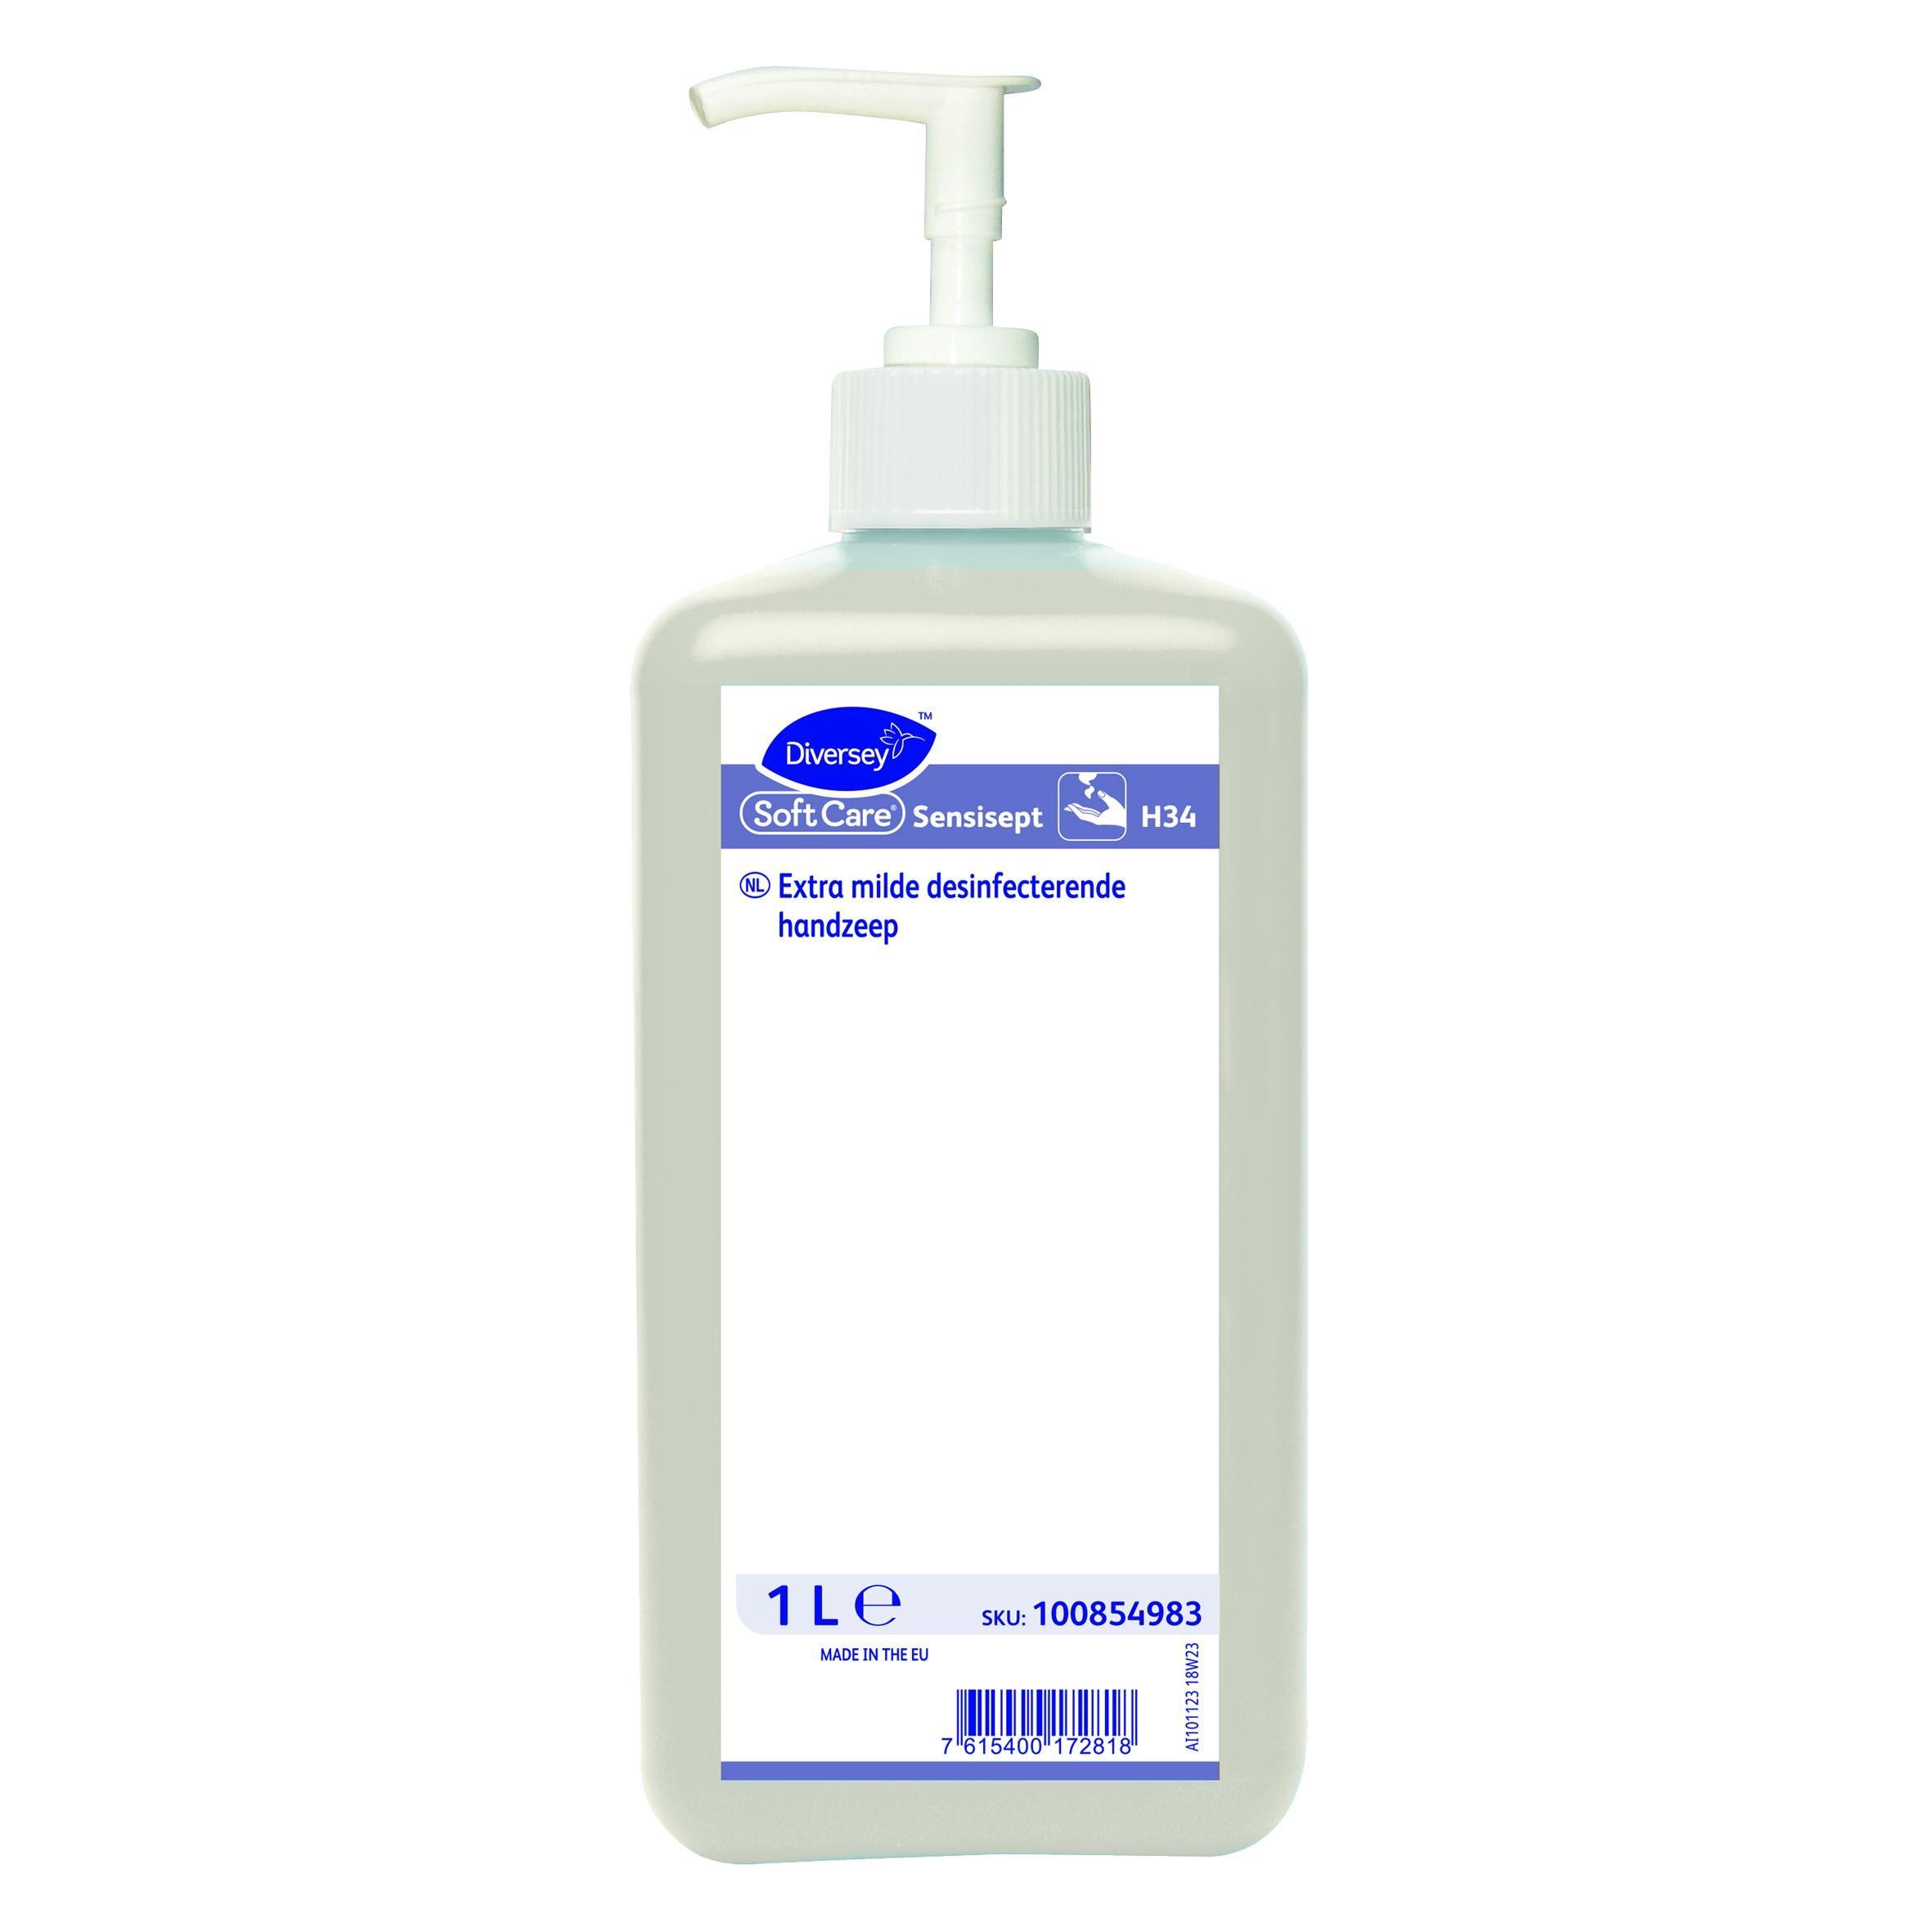 100854983-Soft-Care-Sensisept-H34-1L-CMYK-20x20cm-with-Pump.jpg